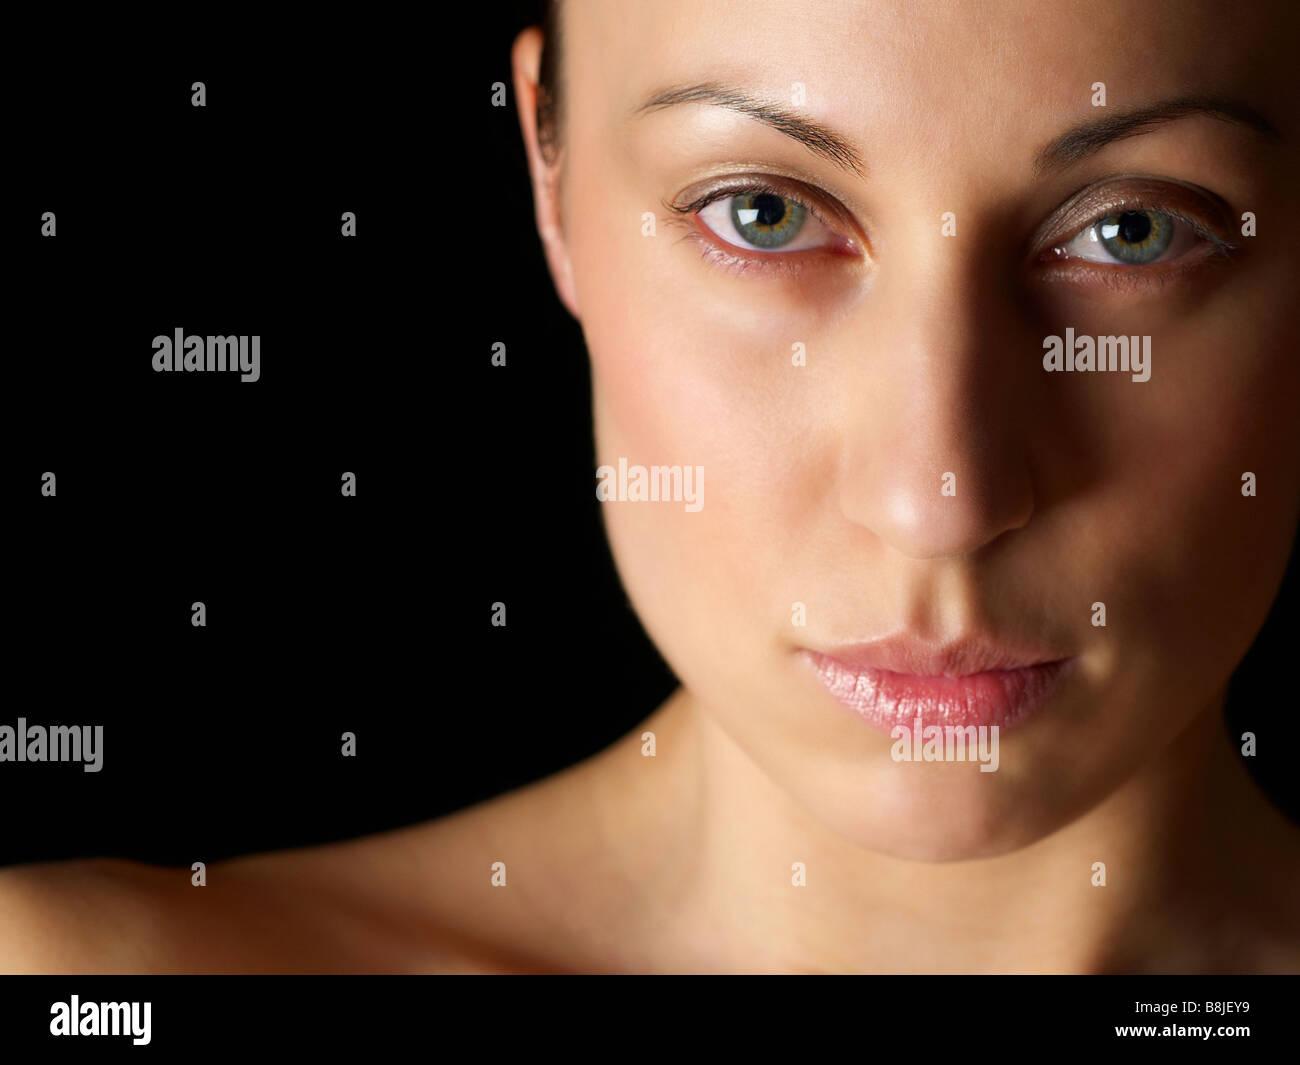 Modelo femenino disparo a la cabeza Imagen De Stock